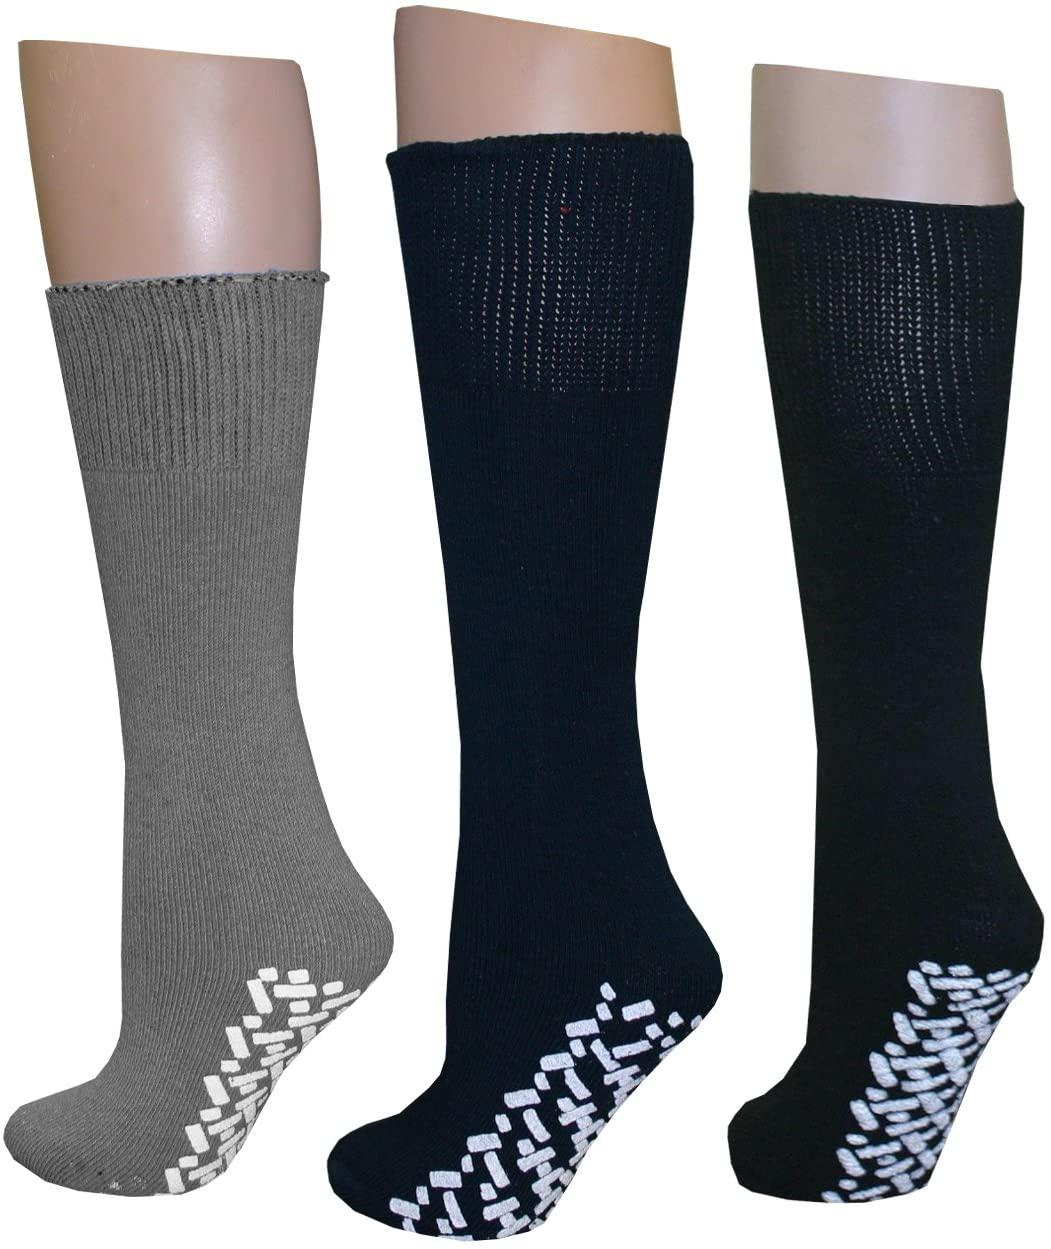 Diabetic Slipper Socks (3 Pairs, 3 Colors) ((1) Pair Black (1) Pair Navy (1) Pair Gray)